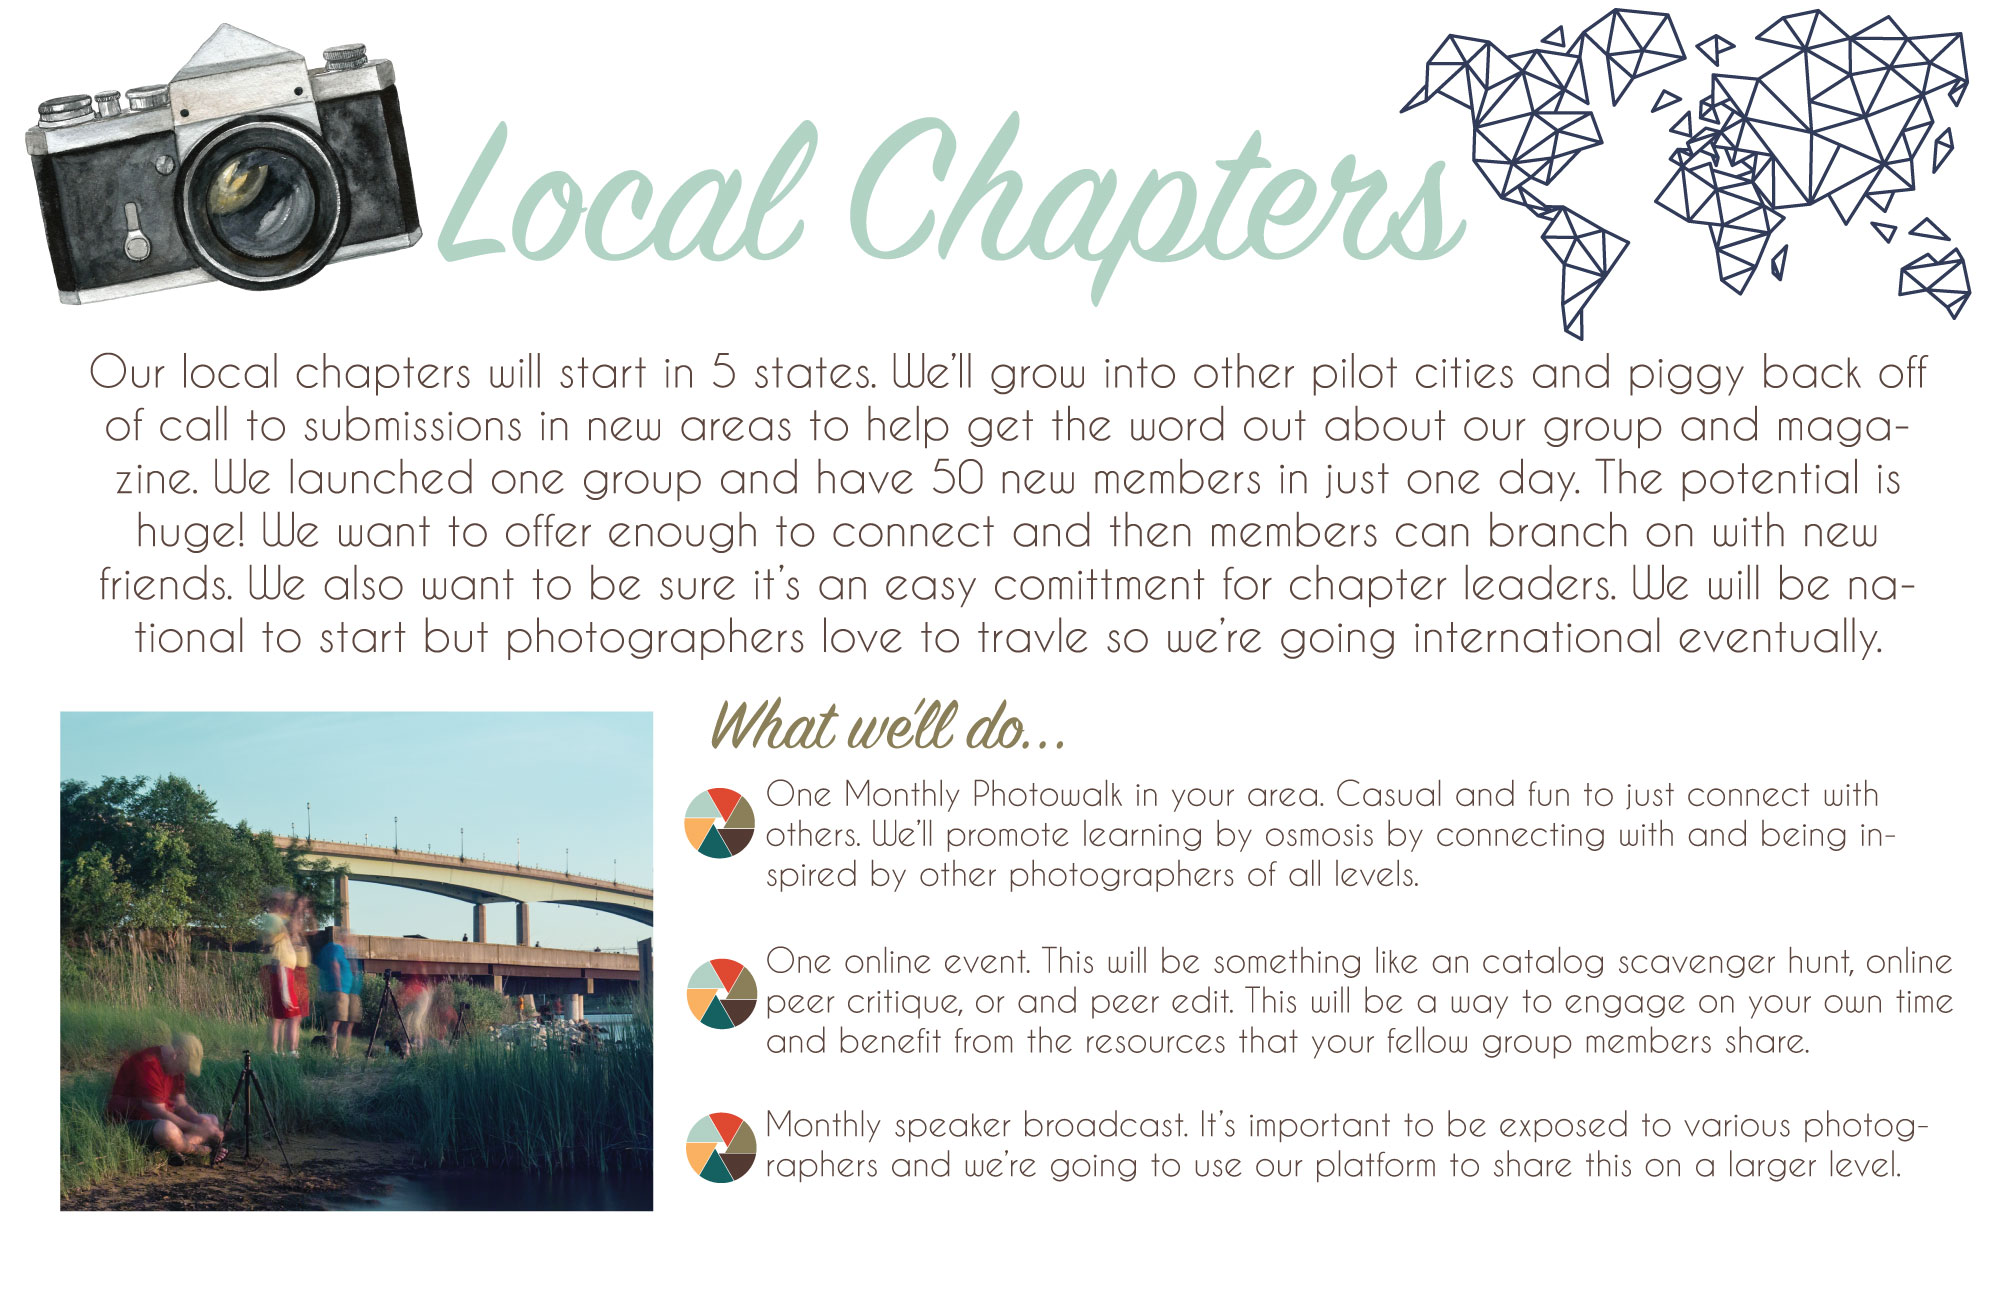 friendtography-local-chapter-info.jpg